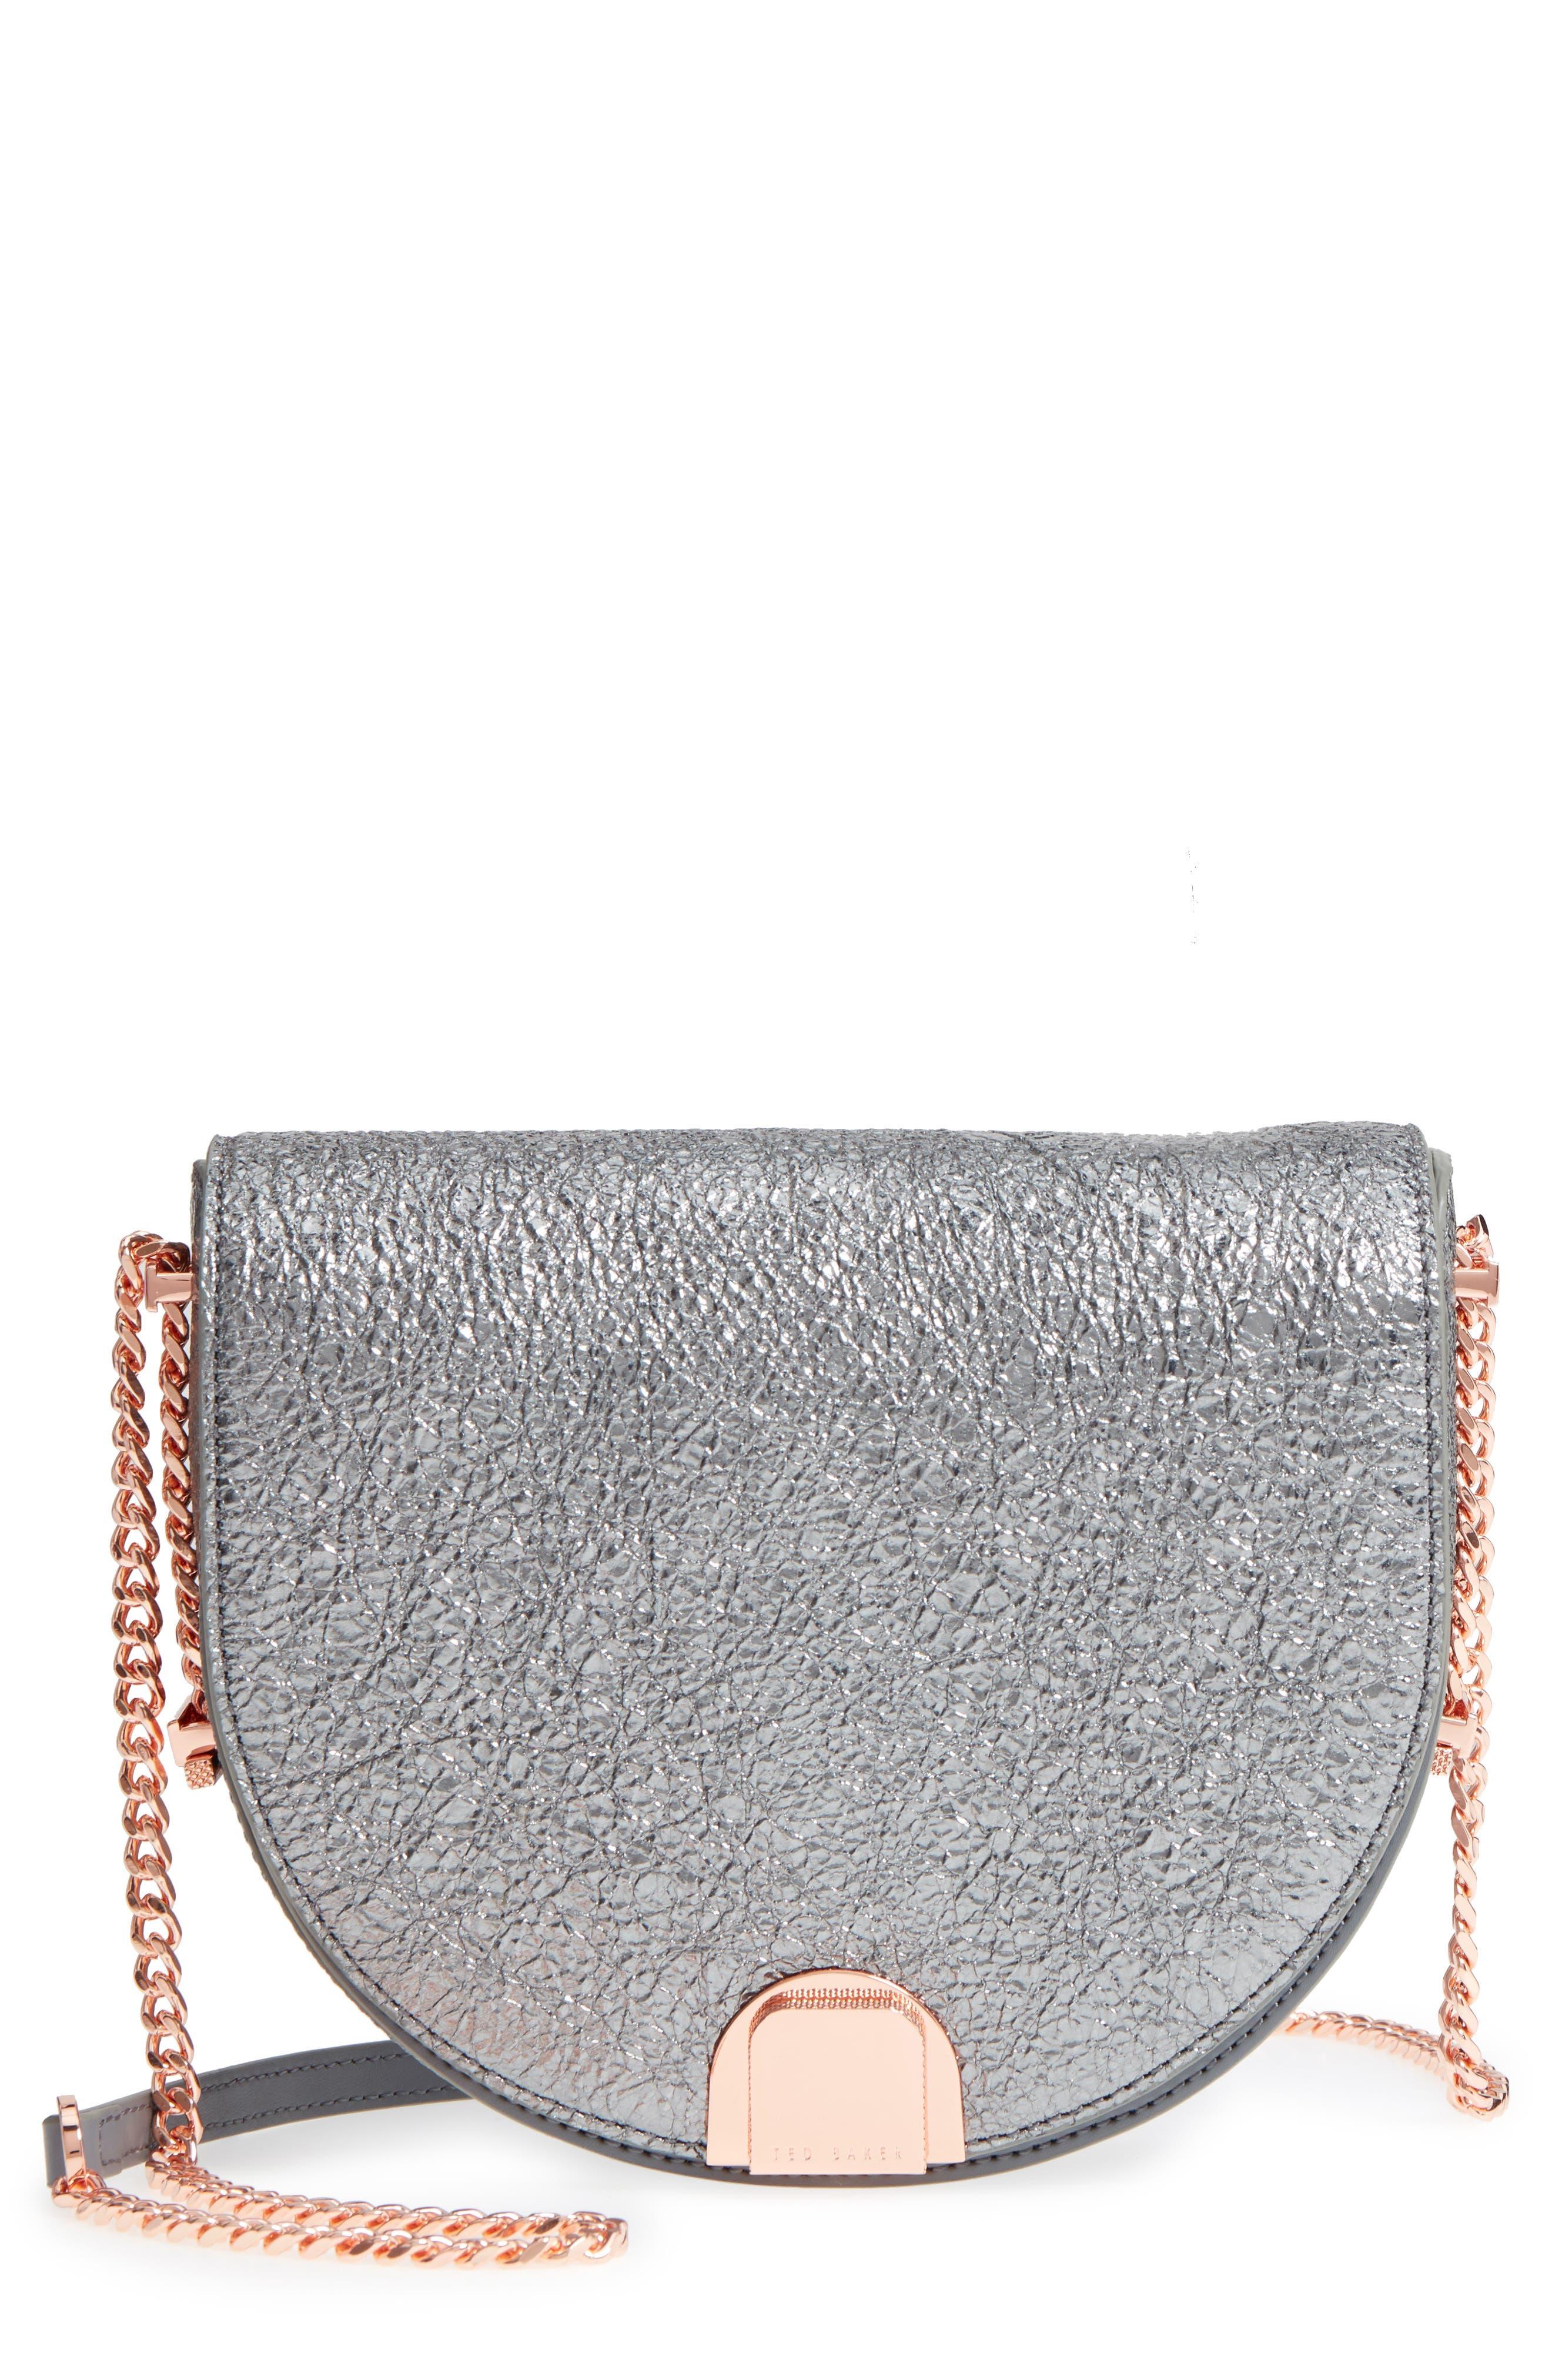 Half Moon Metallic Leather Crossbody Bag,                             Main thumbnail 1, color,                             Gunmetal